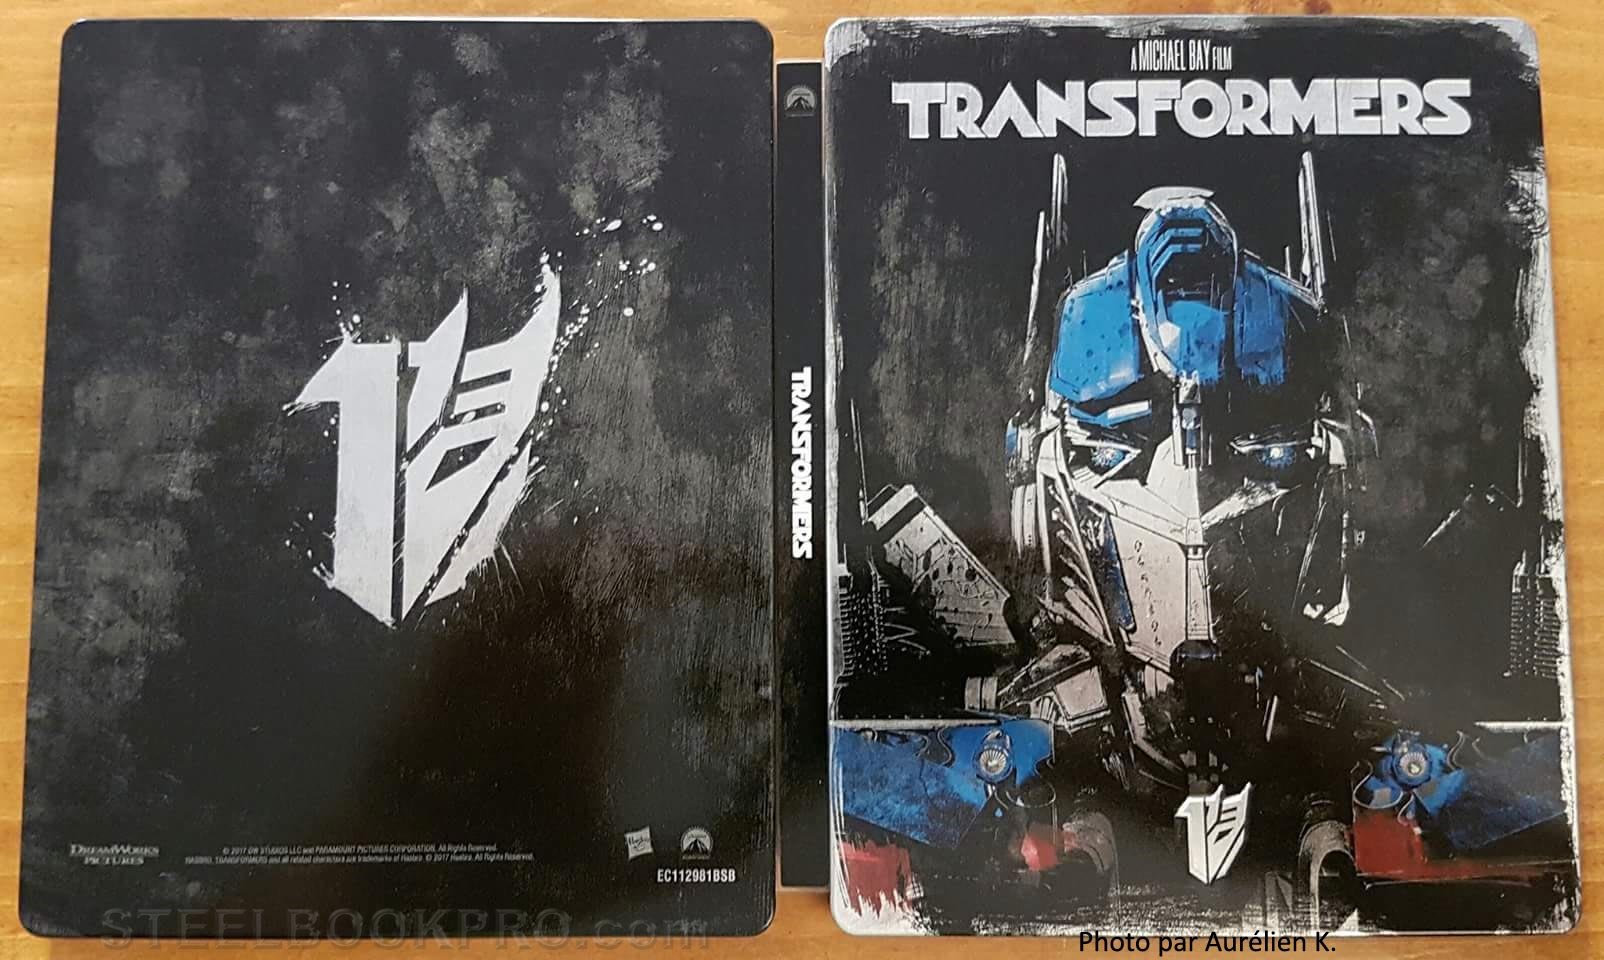 Transformers-steelbook-1